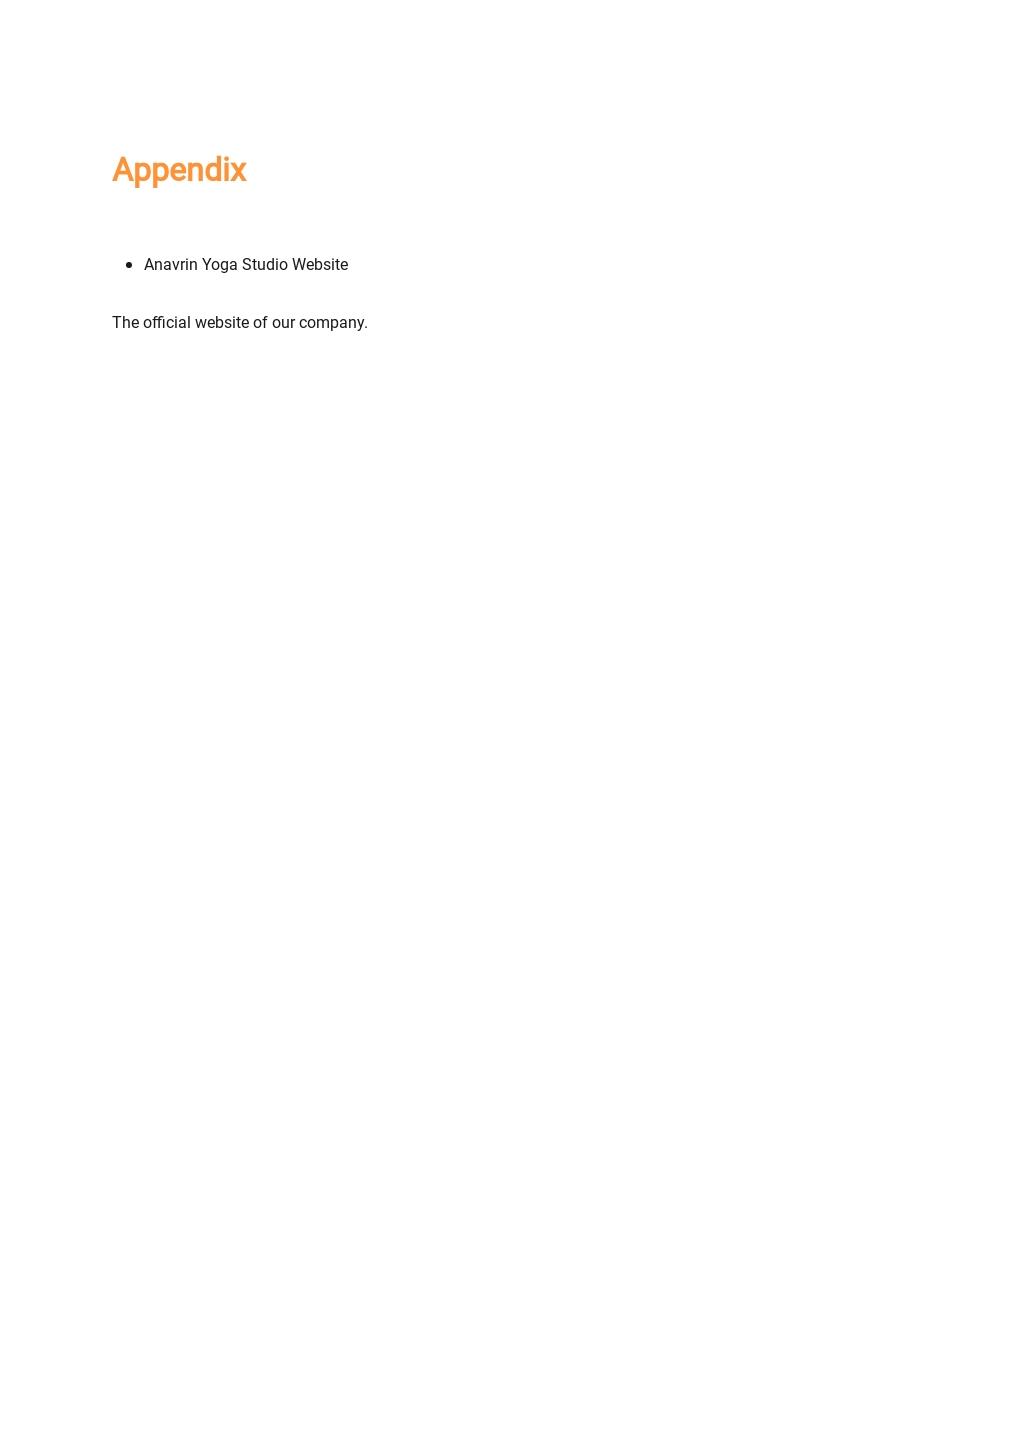 Yoga Studio Business Plan Template 9.jpe